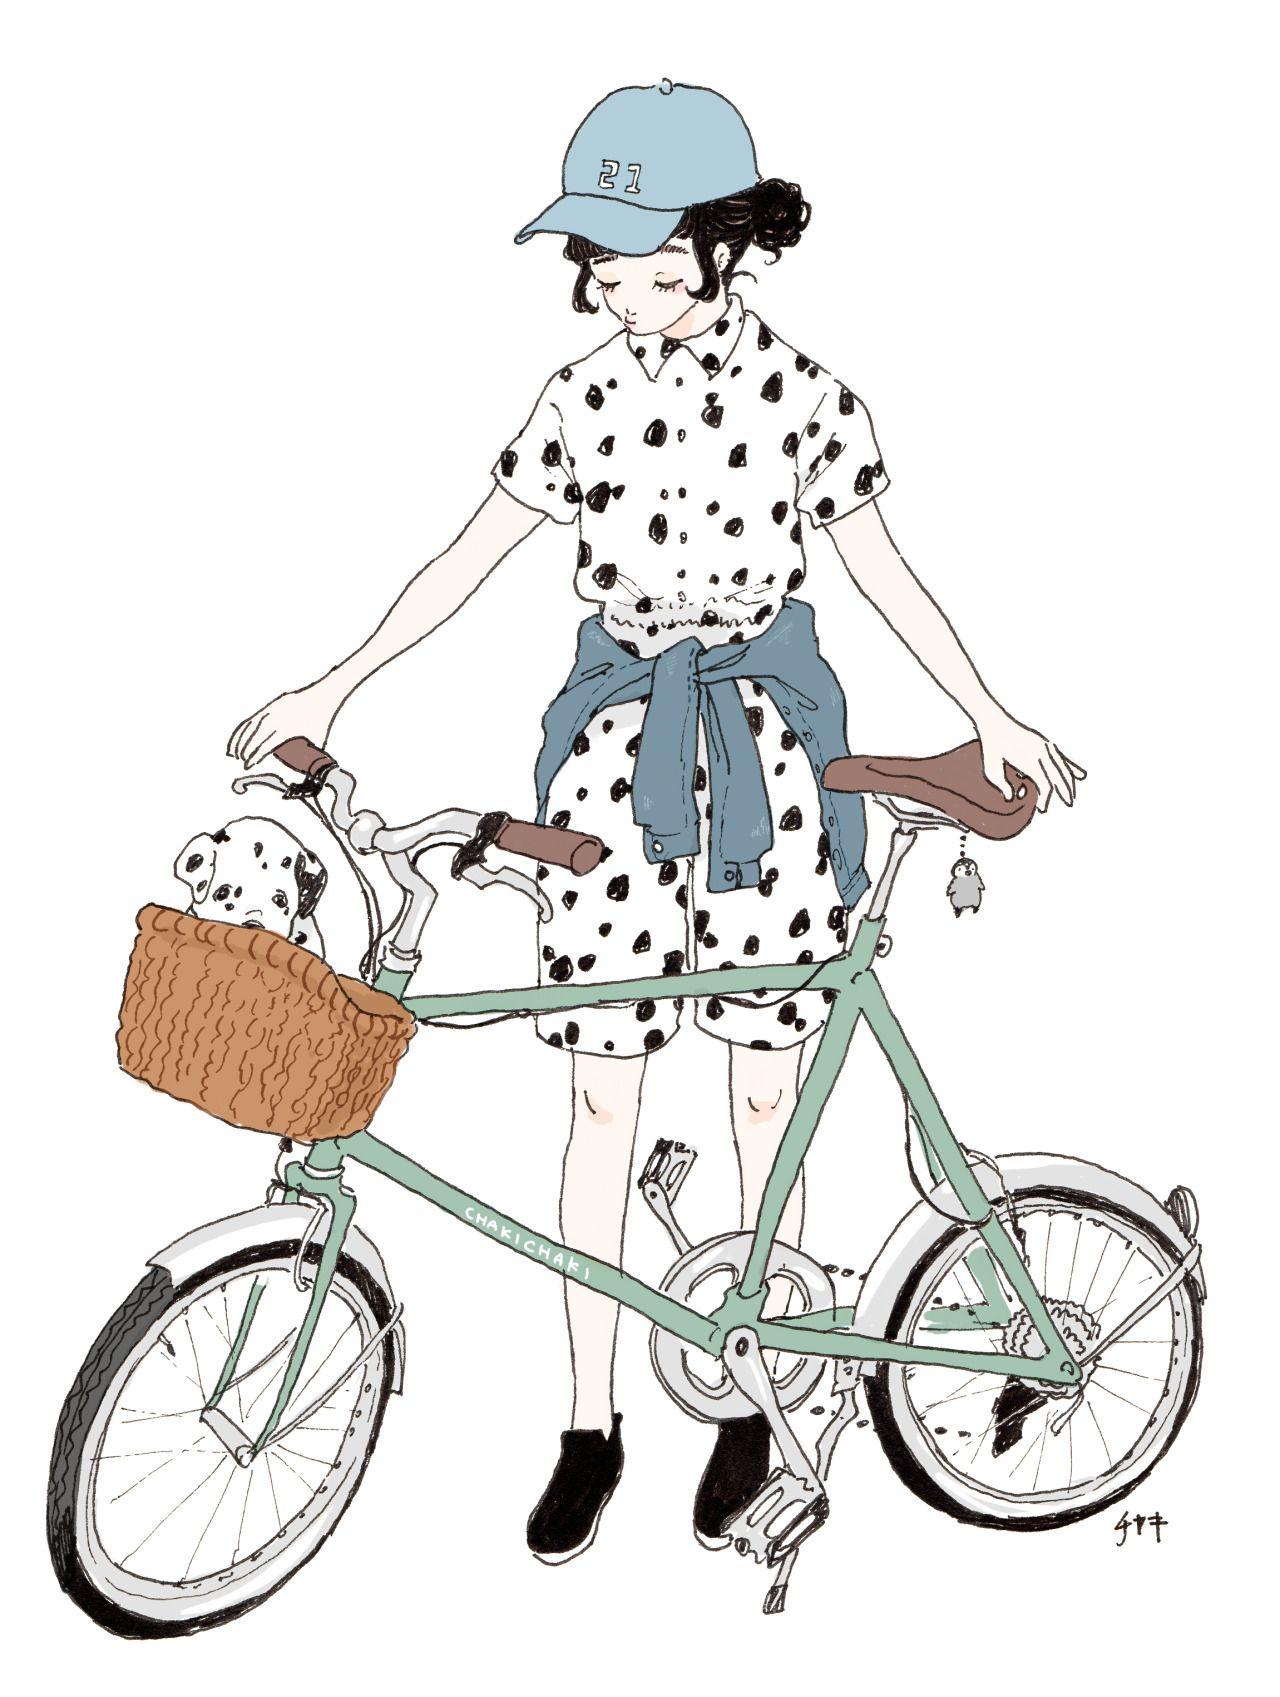 art 」おしゃれまとめの人気アイデア|Pinterest|jazmine walker 風船 イラスト